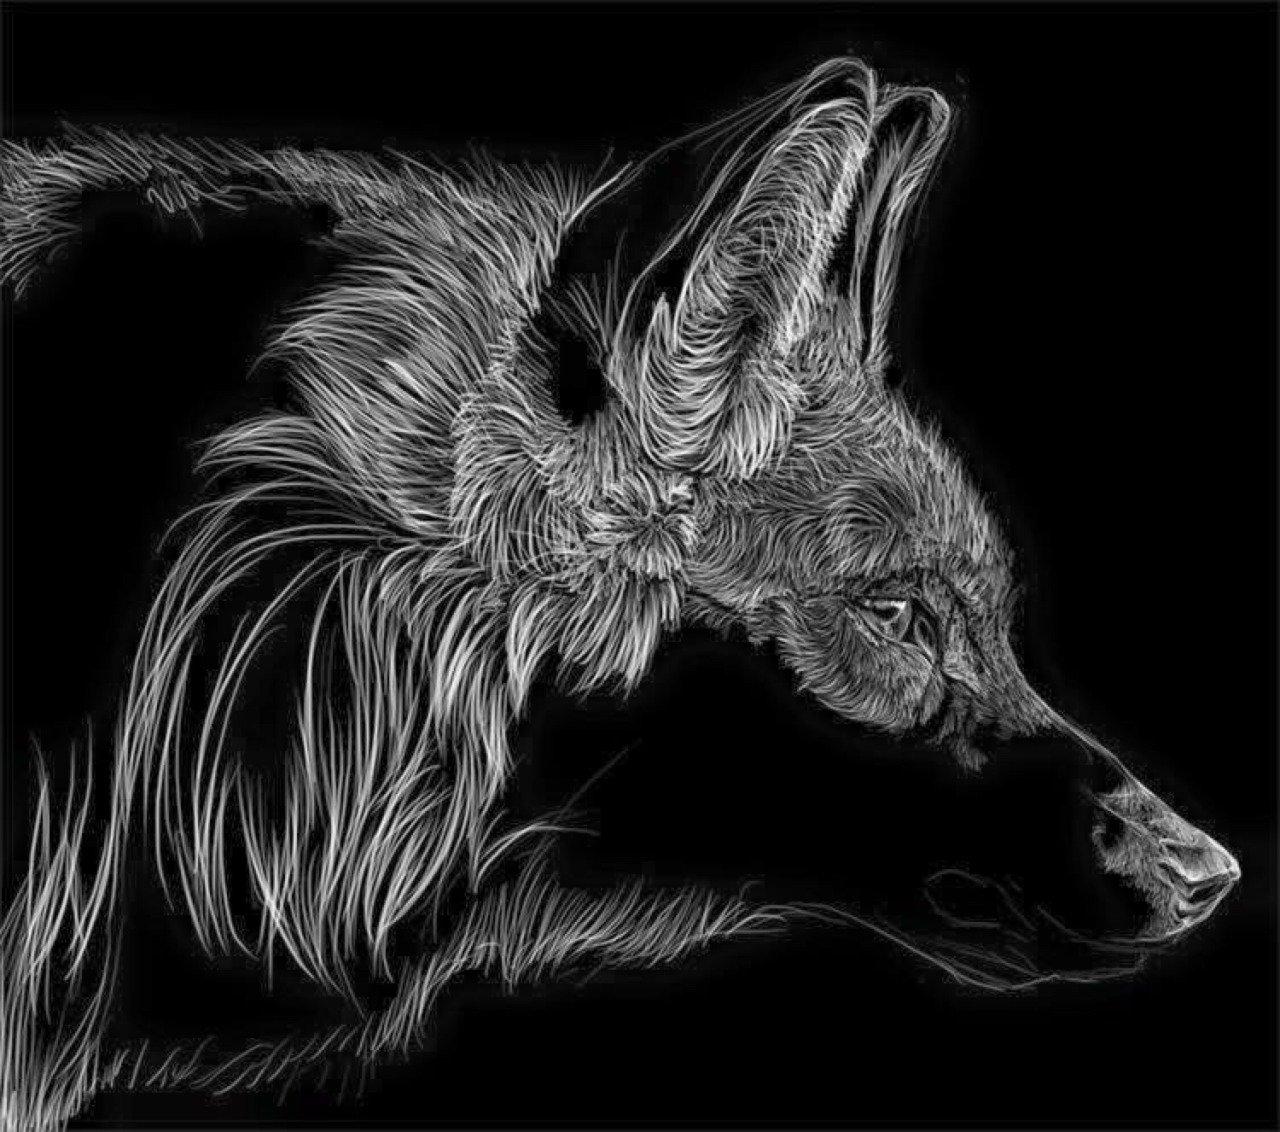 Черно-белый волк картинки